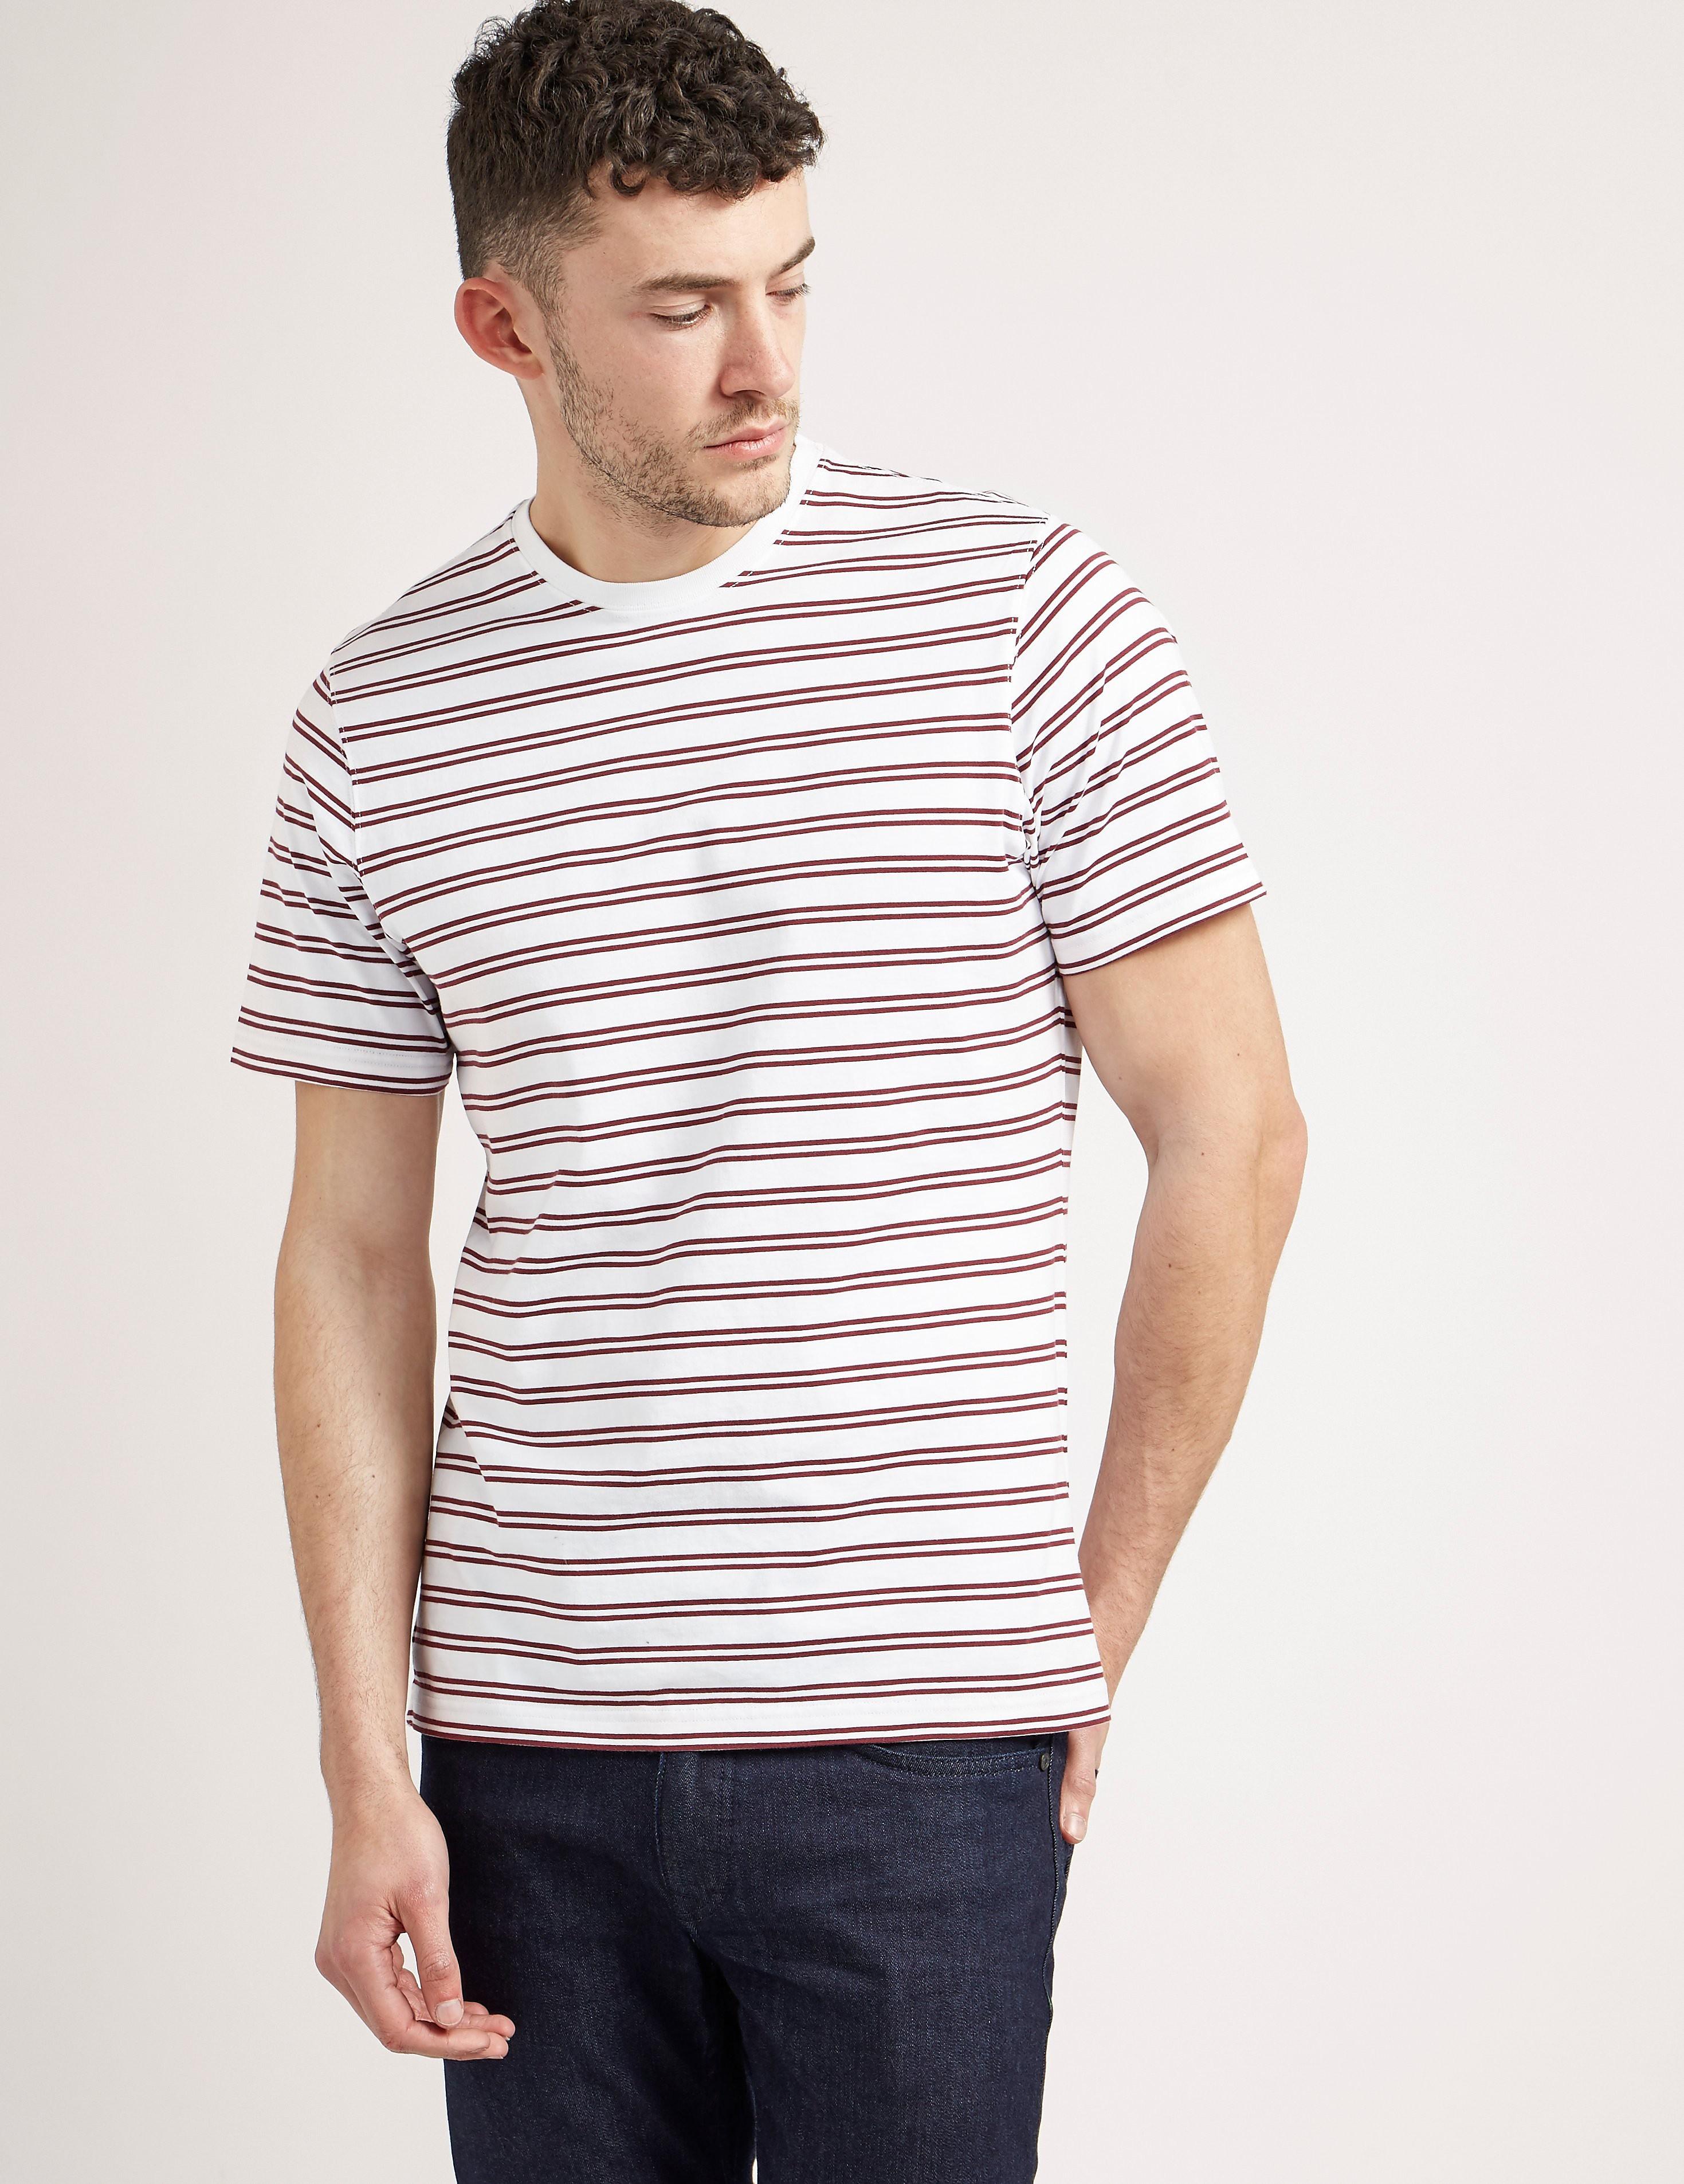 Barbour Oakham Short Sleeve T-Shirt